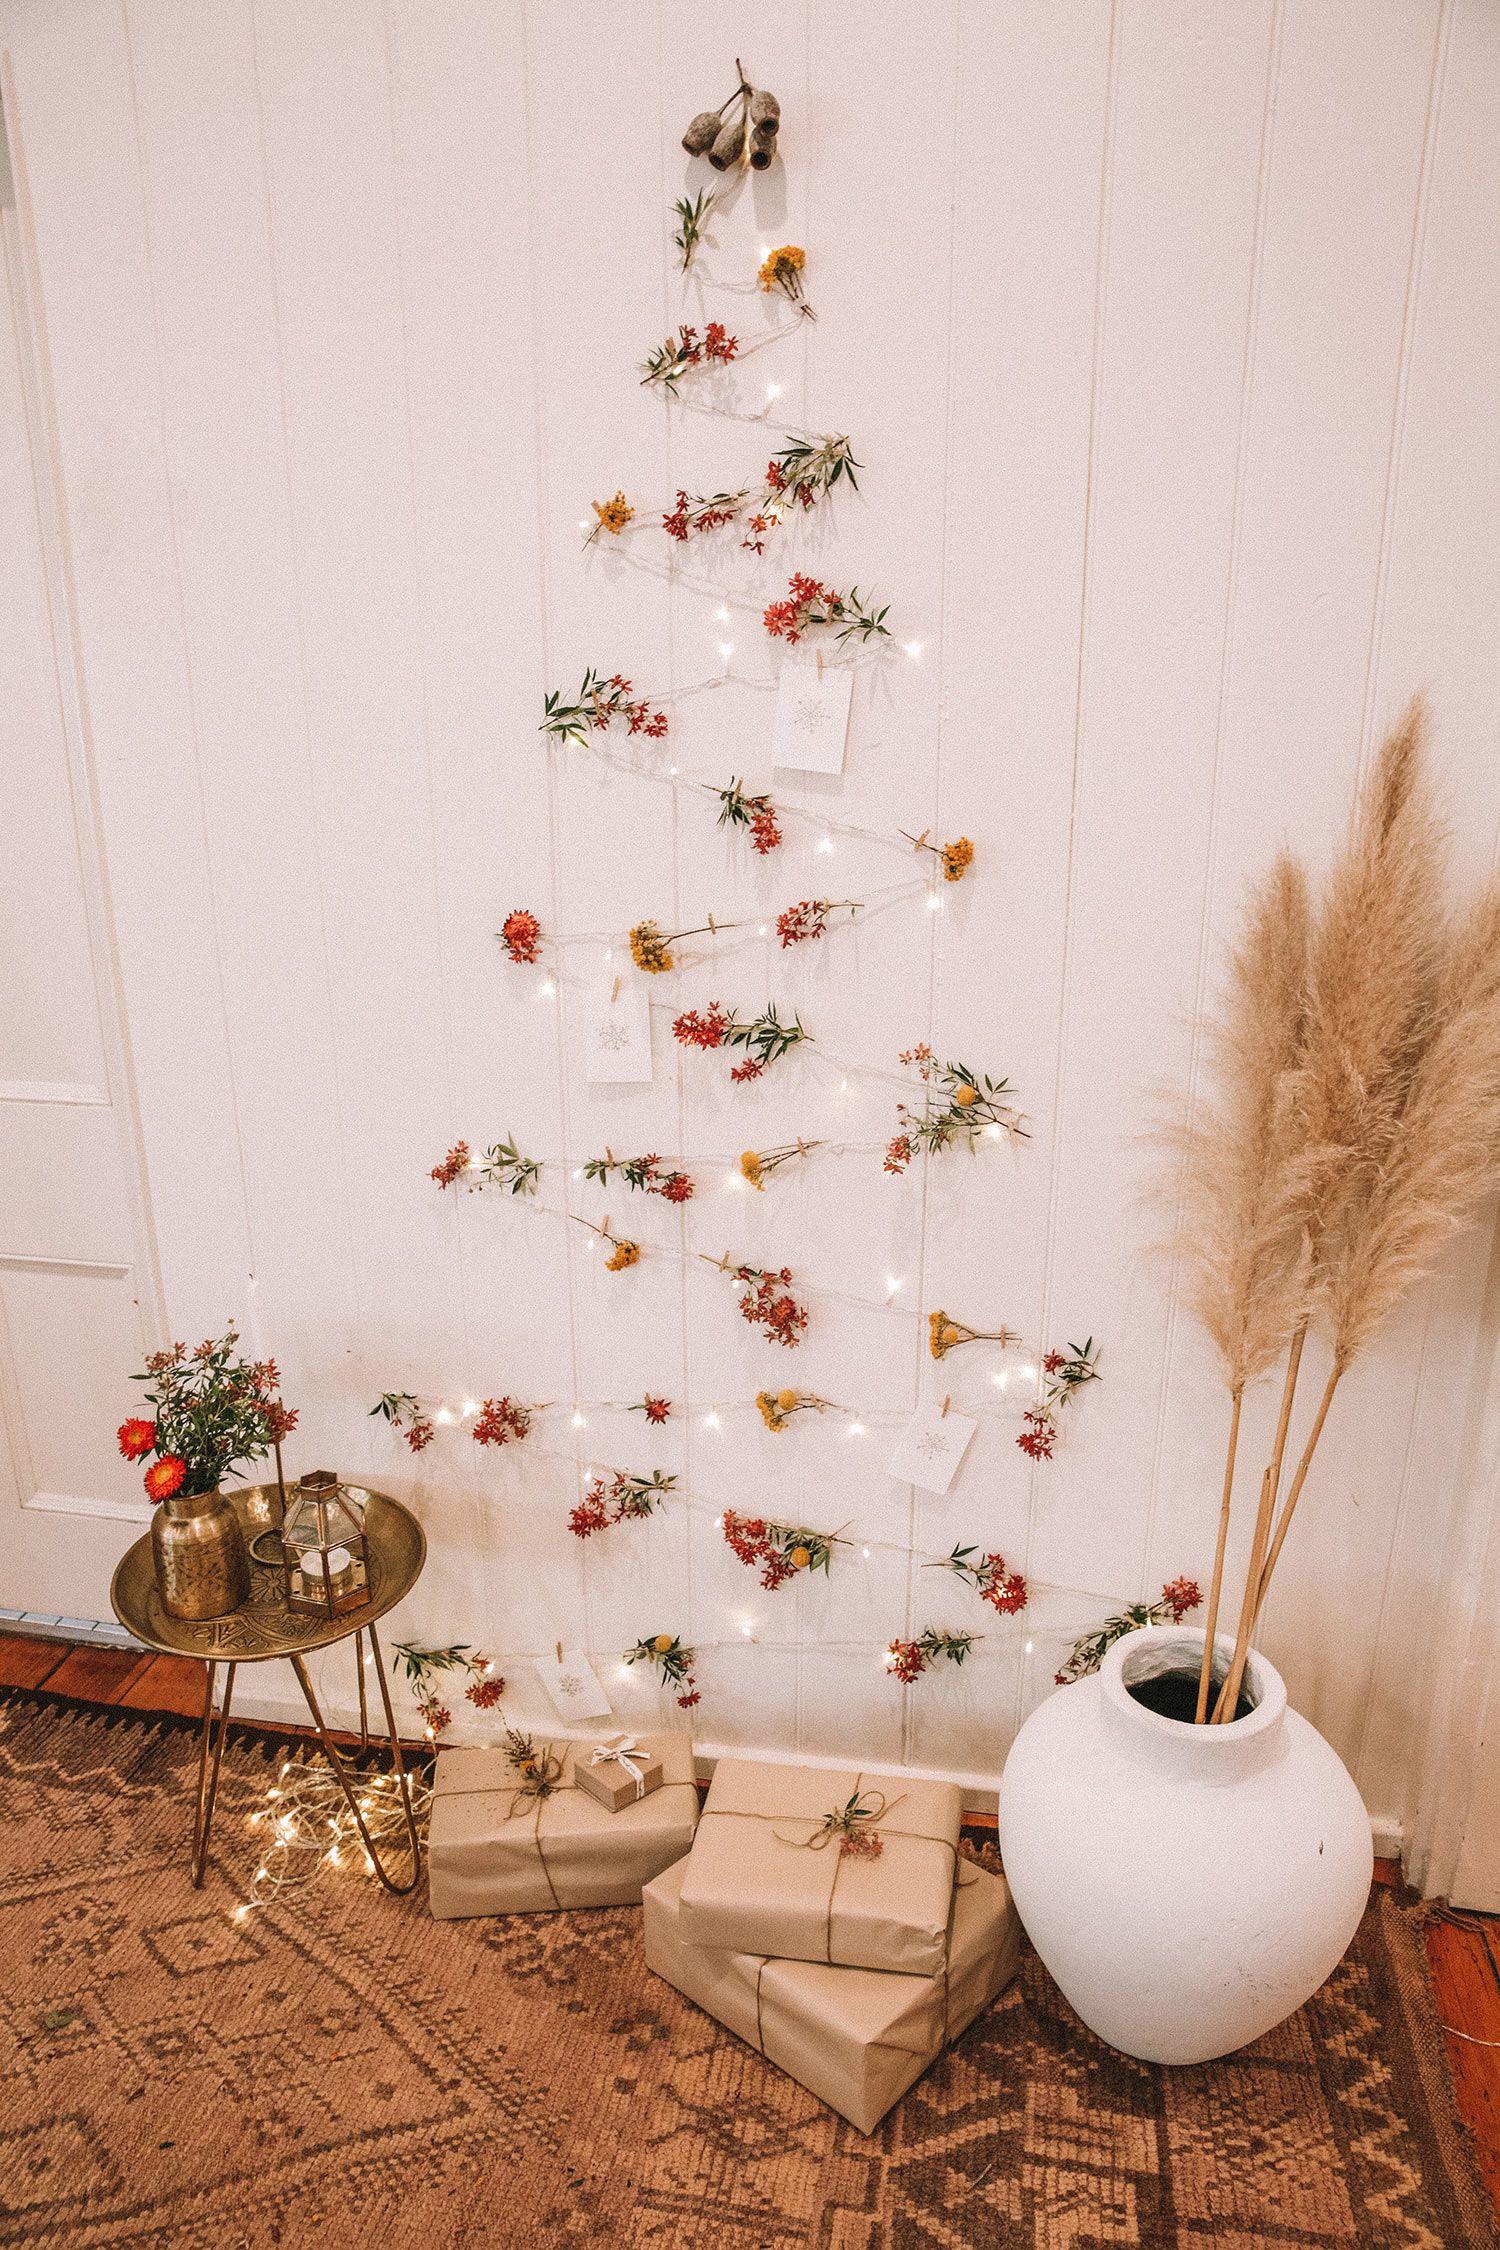 Decorative Ornaments For Living Room: DIY: Fairy Light Christmas Tree